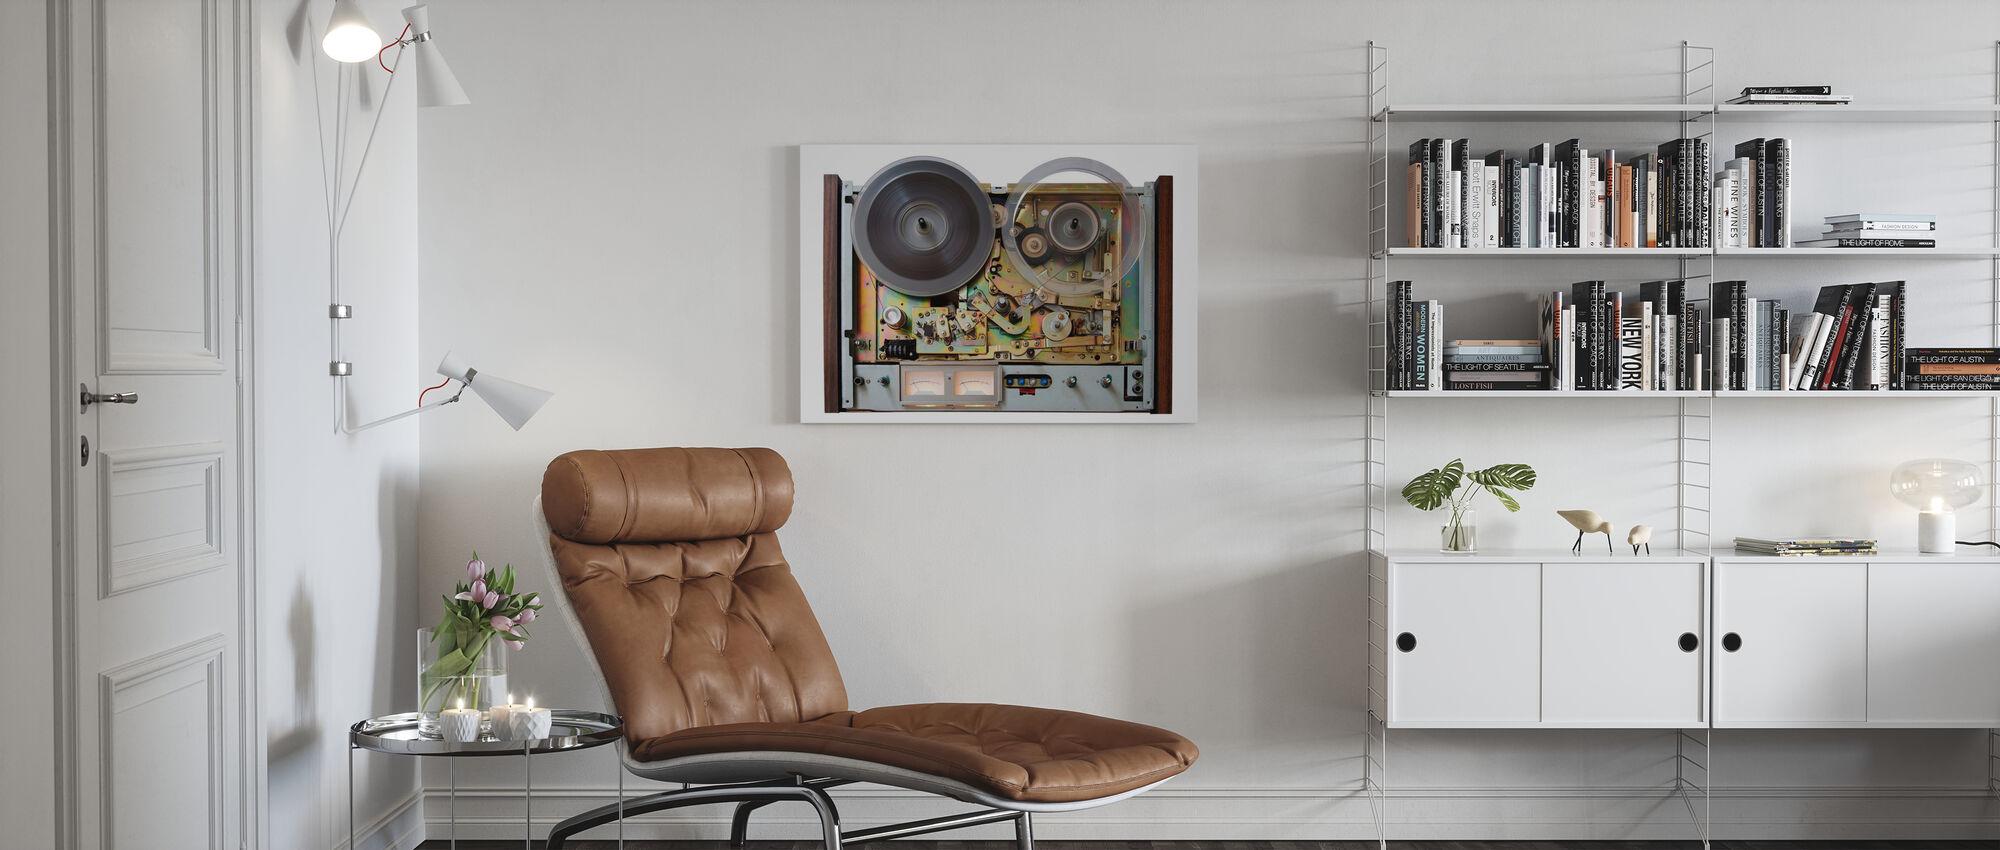 Taperecorder analogique vintage - Impression sur toile - Salle à manger